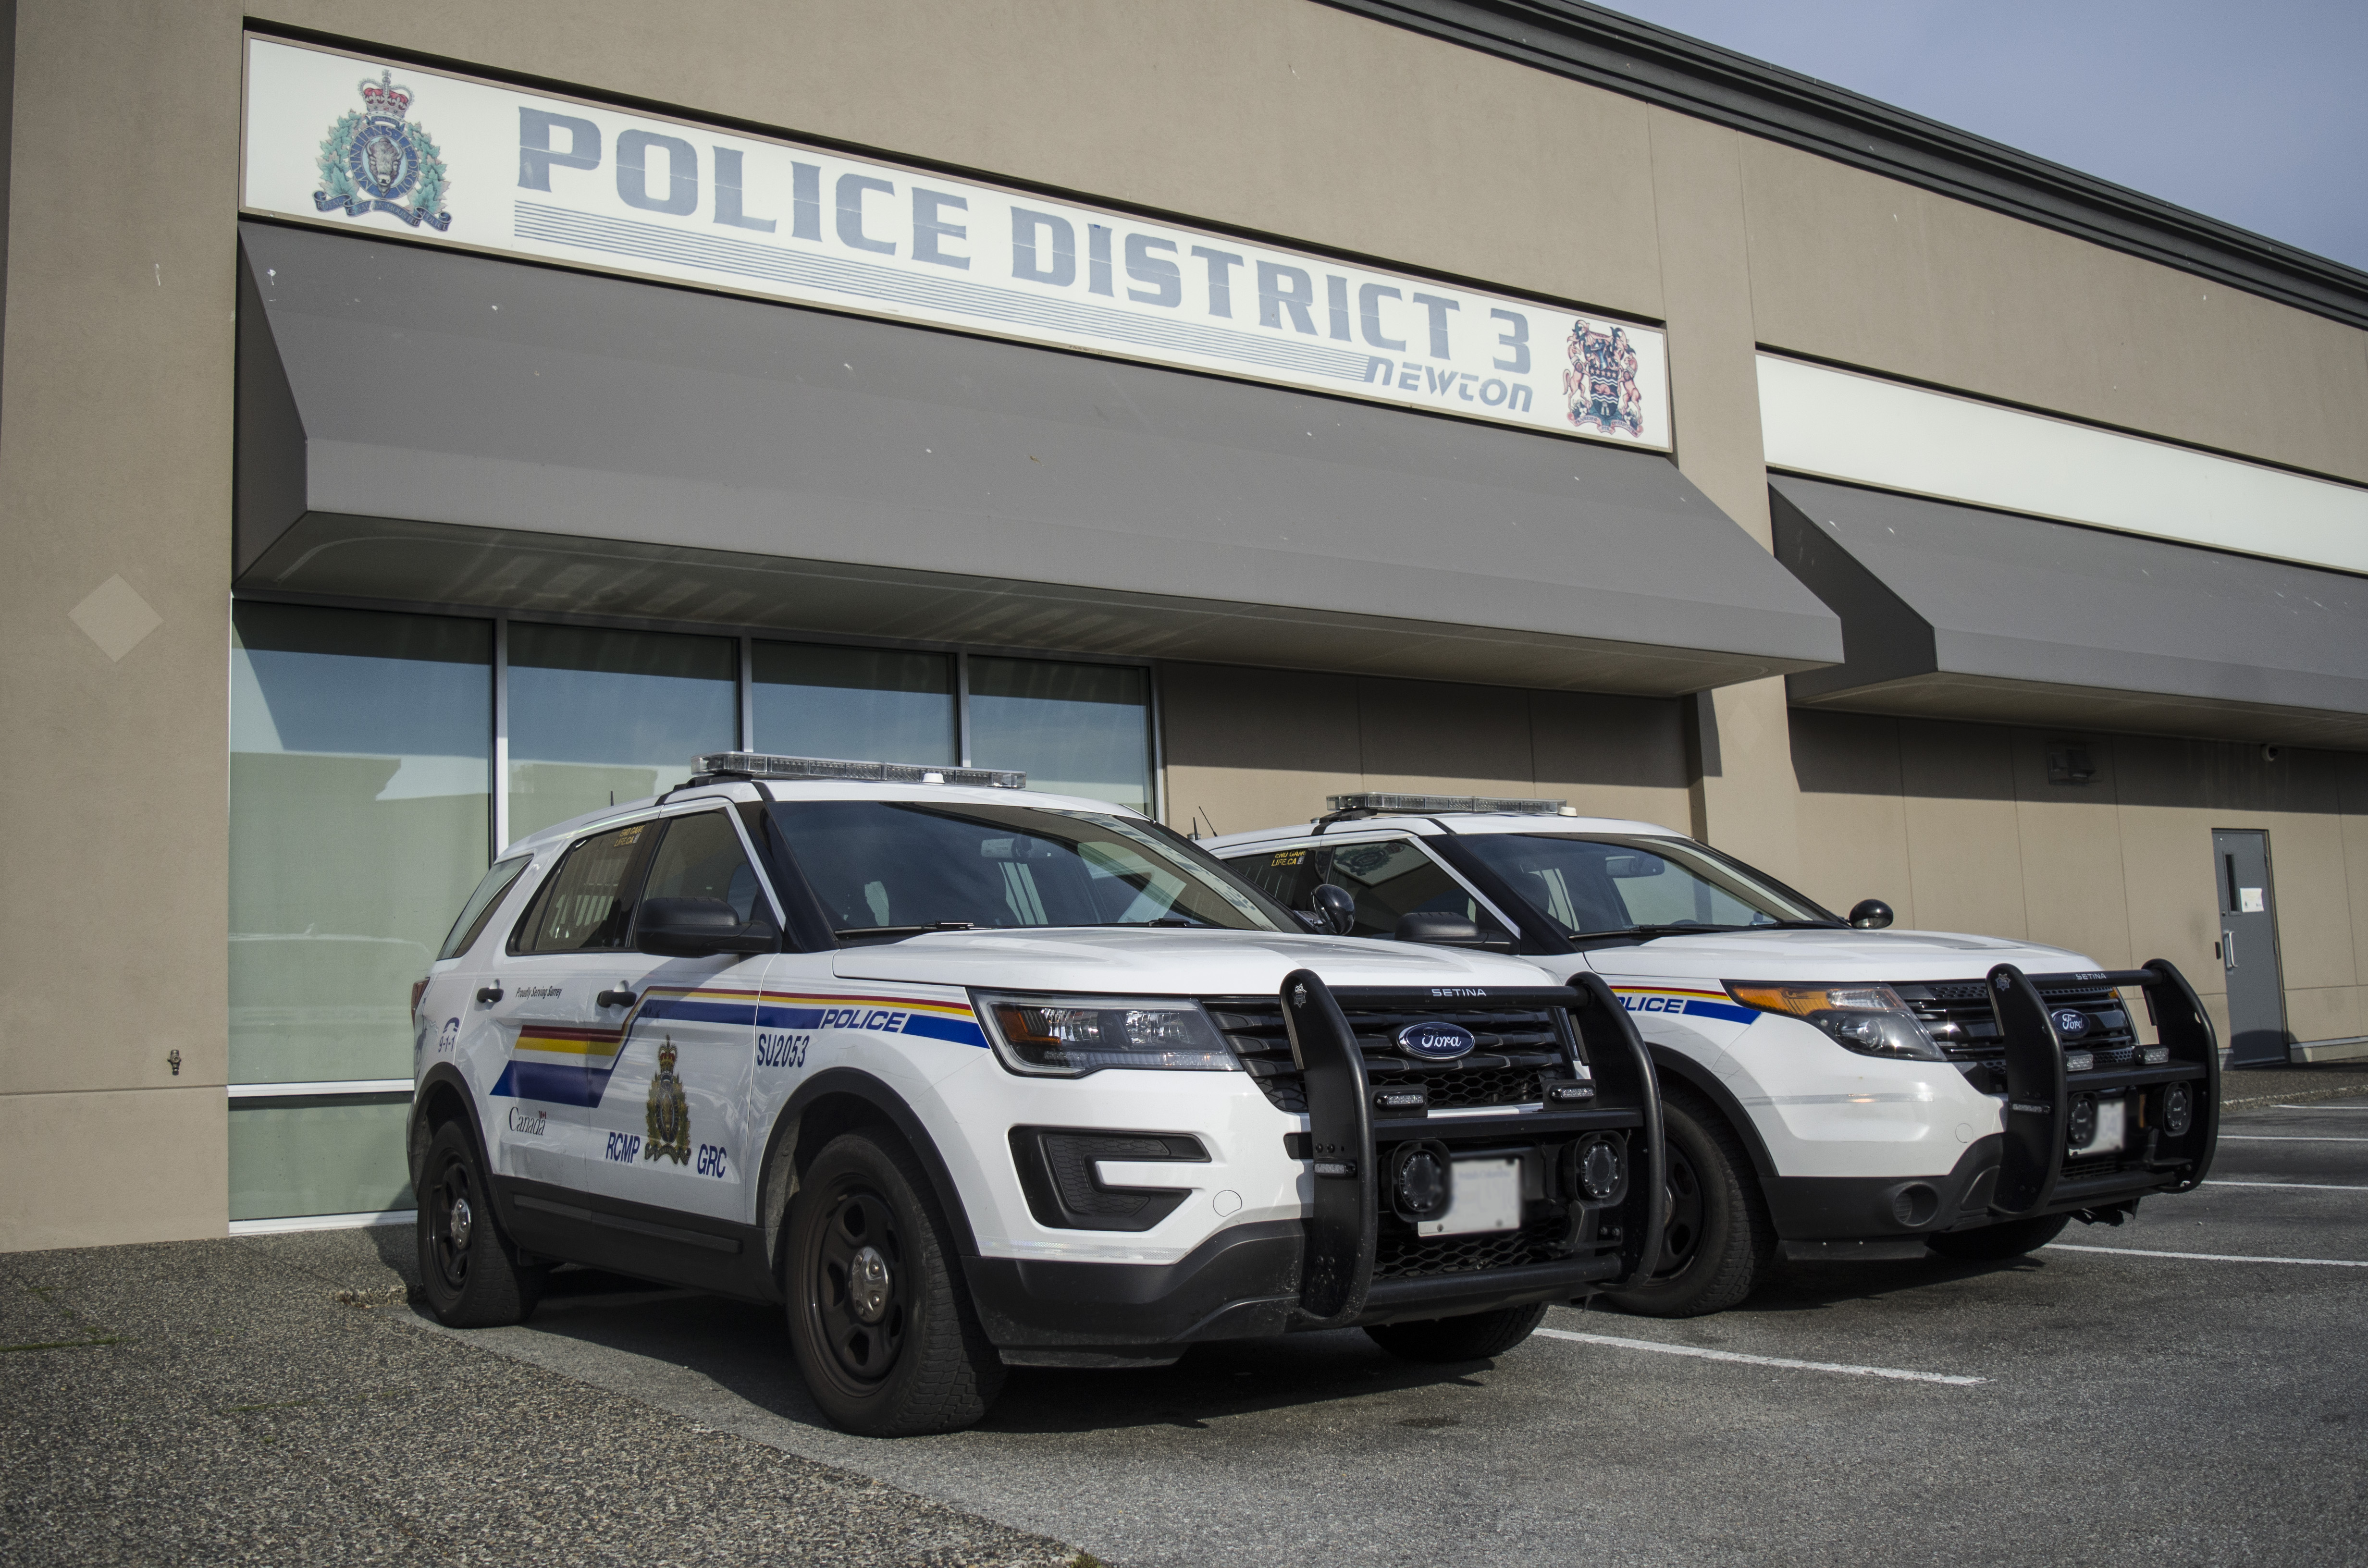 Surrey RCMP cruisers parked outside the District 3 precinct police station in Newton. (Braden Klassen)